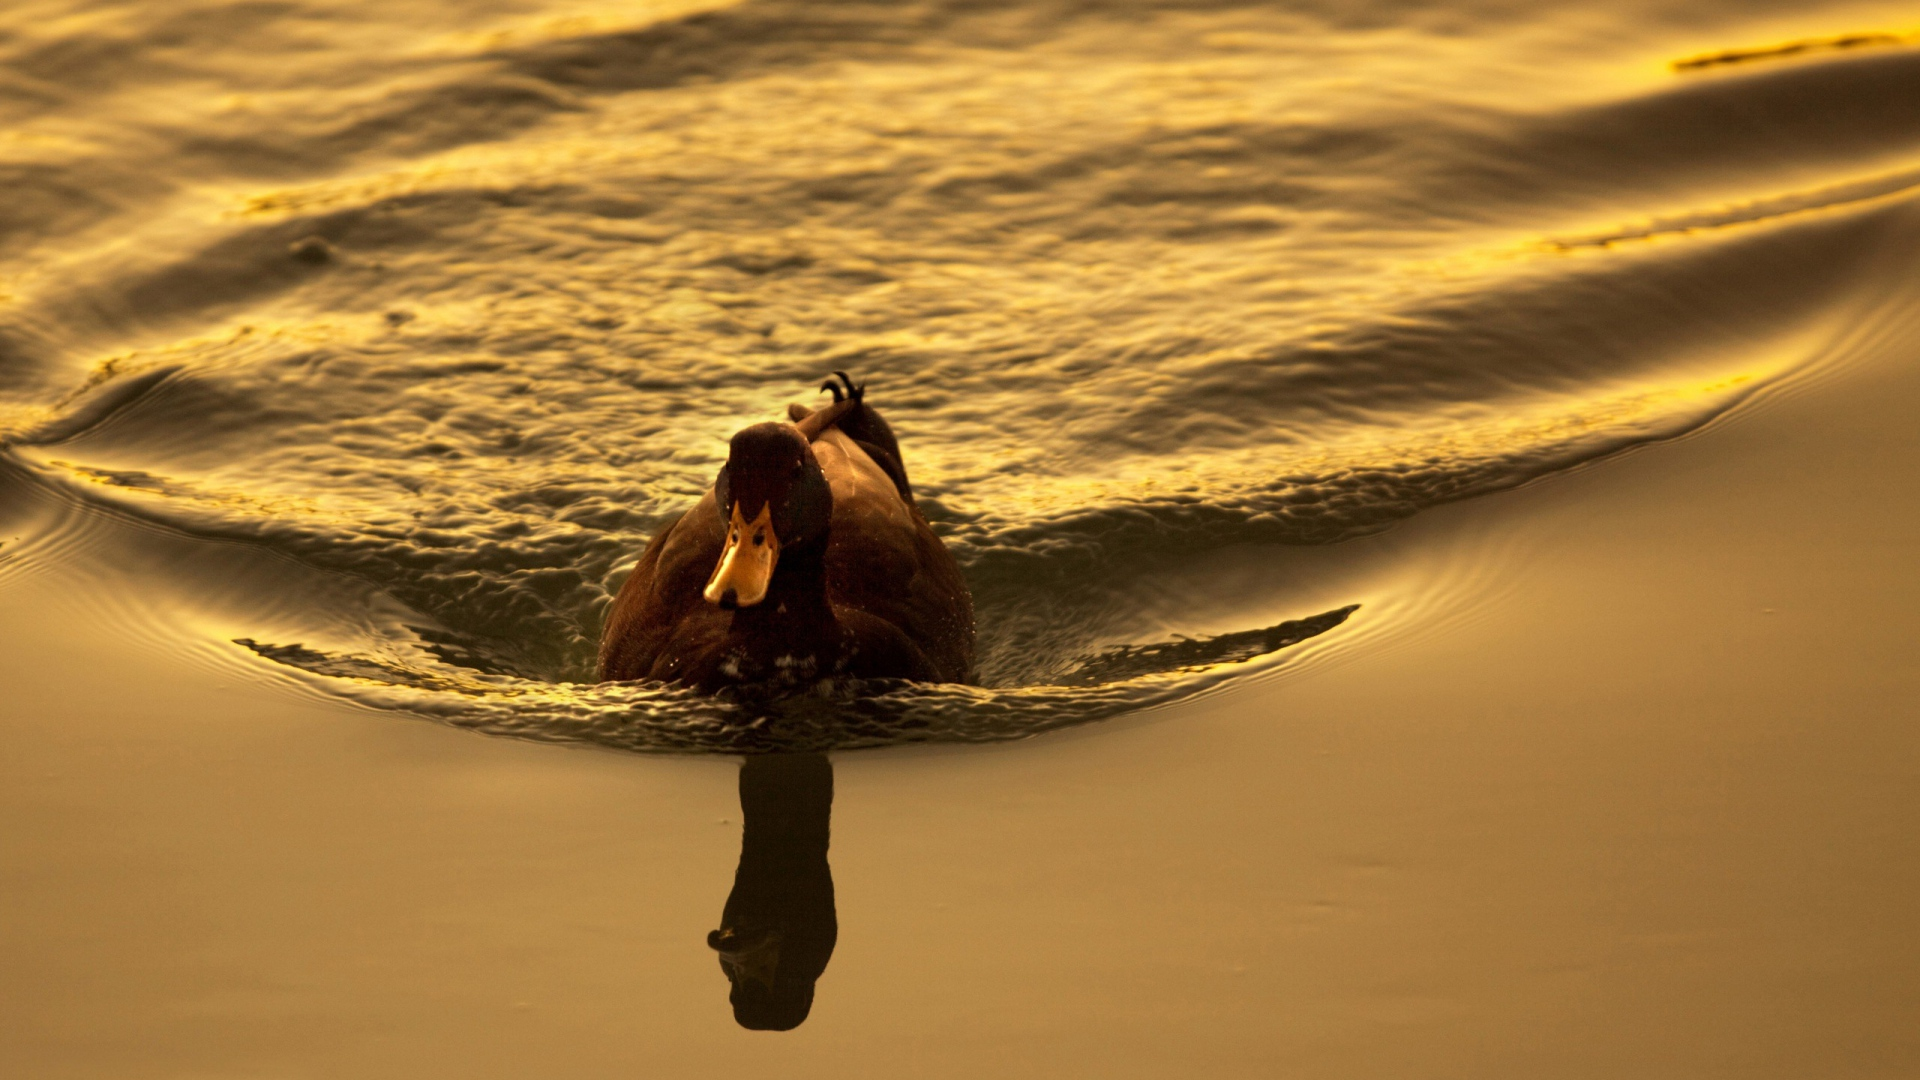 Download Wallpaper 1920x1080 duck, lake, swimming, sunset ...